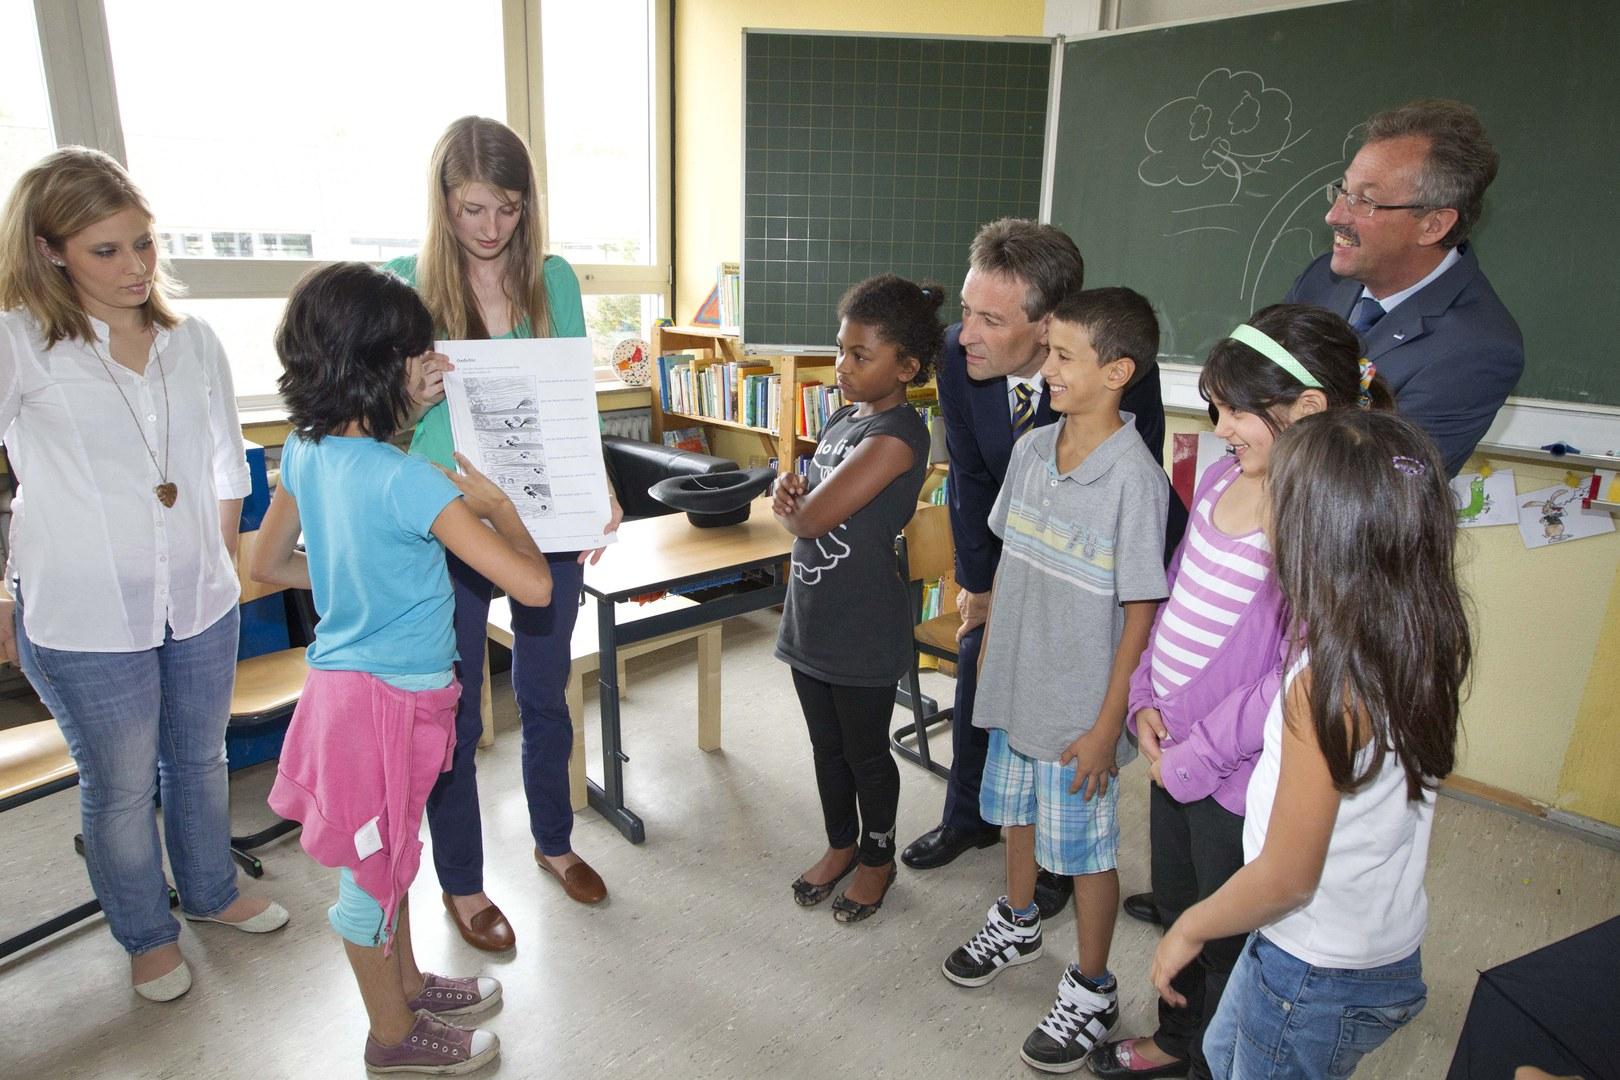 PK-Gotenschule-11-09-2012-04.jpg